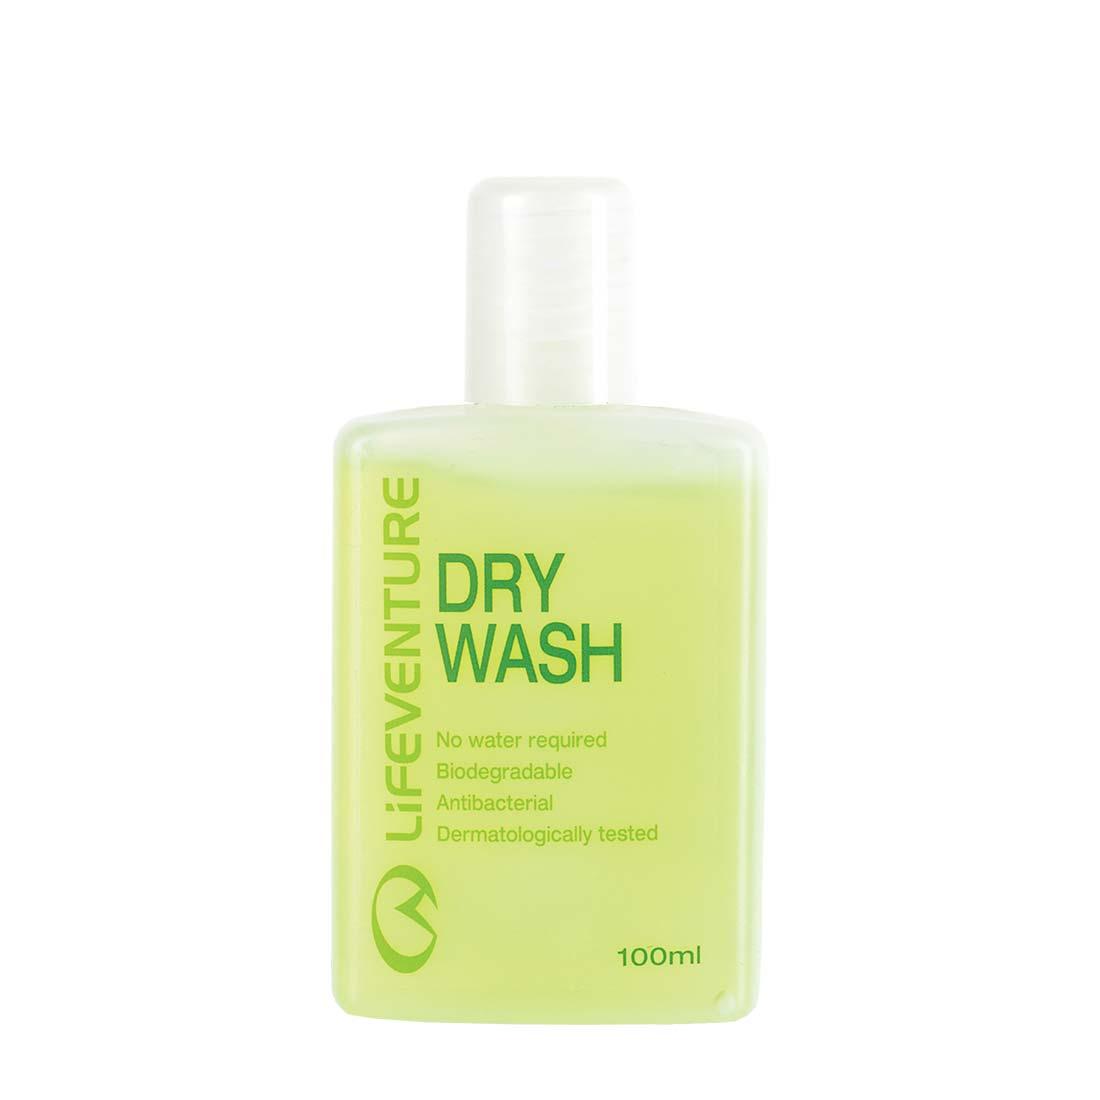 Dry Body Wash (100ml)